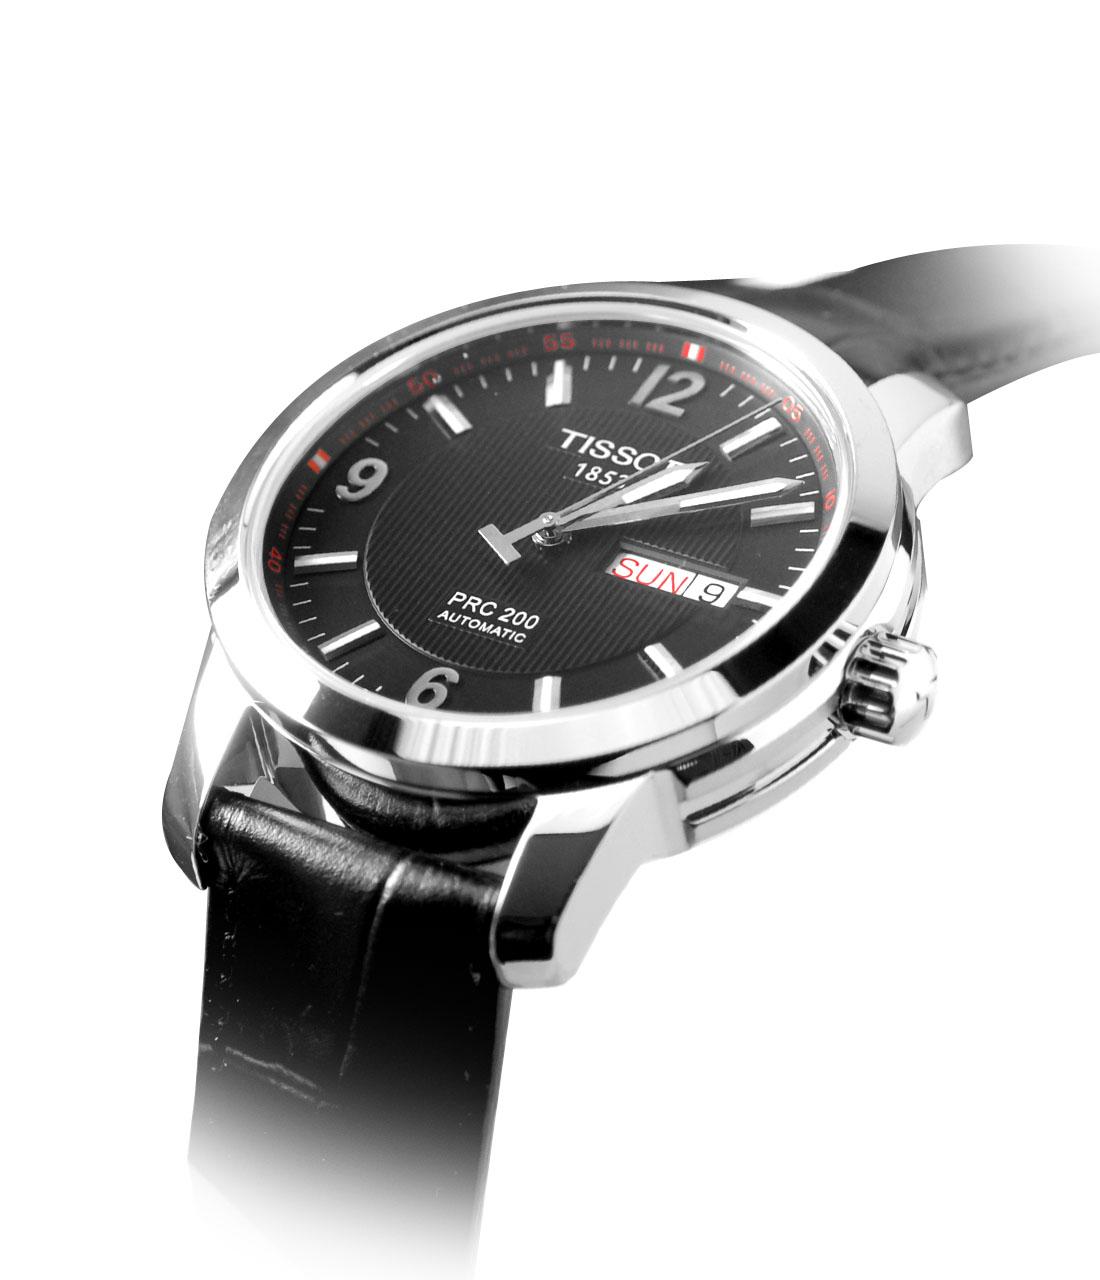 Đồng hồ Tissot 1853 T014.430.16.057.00